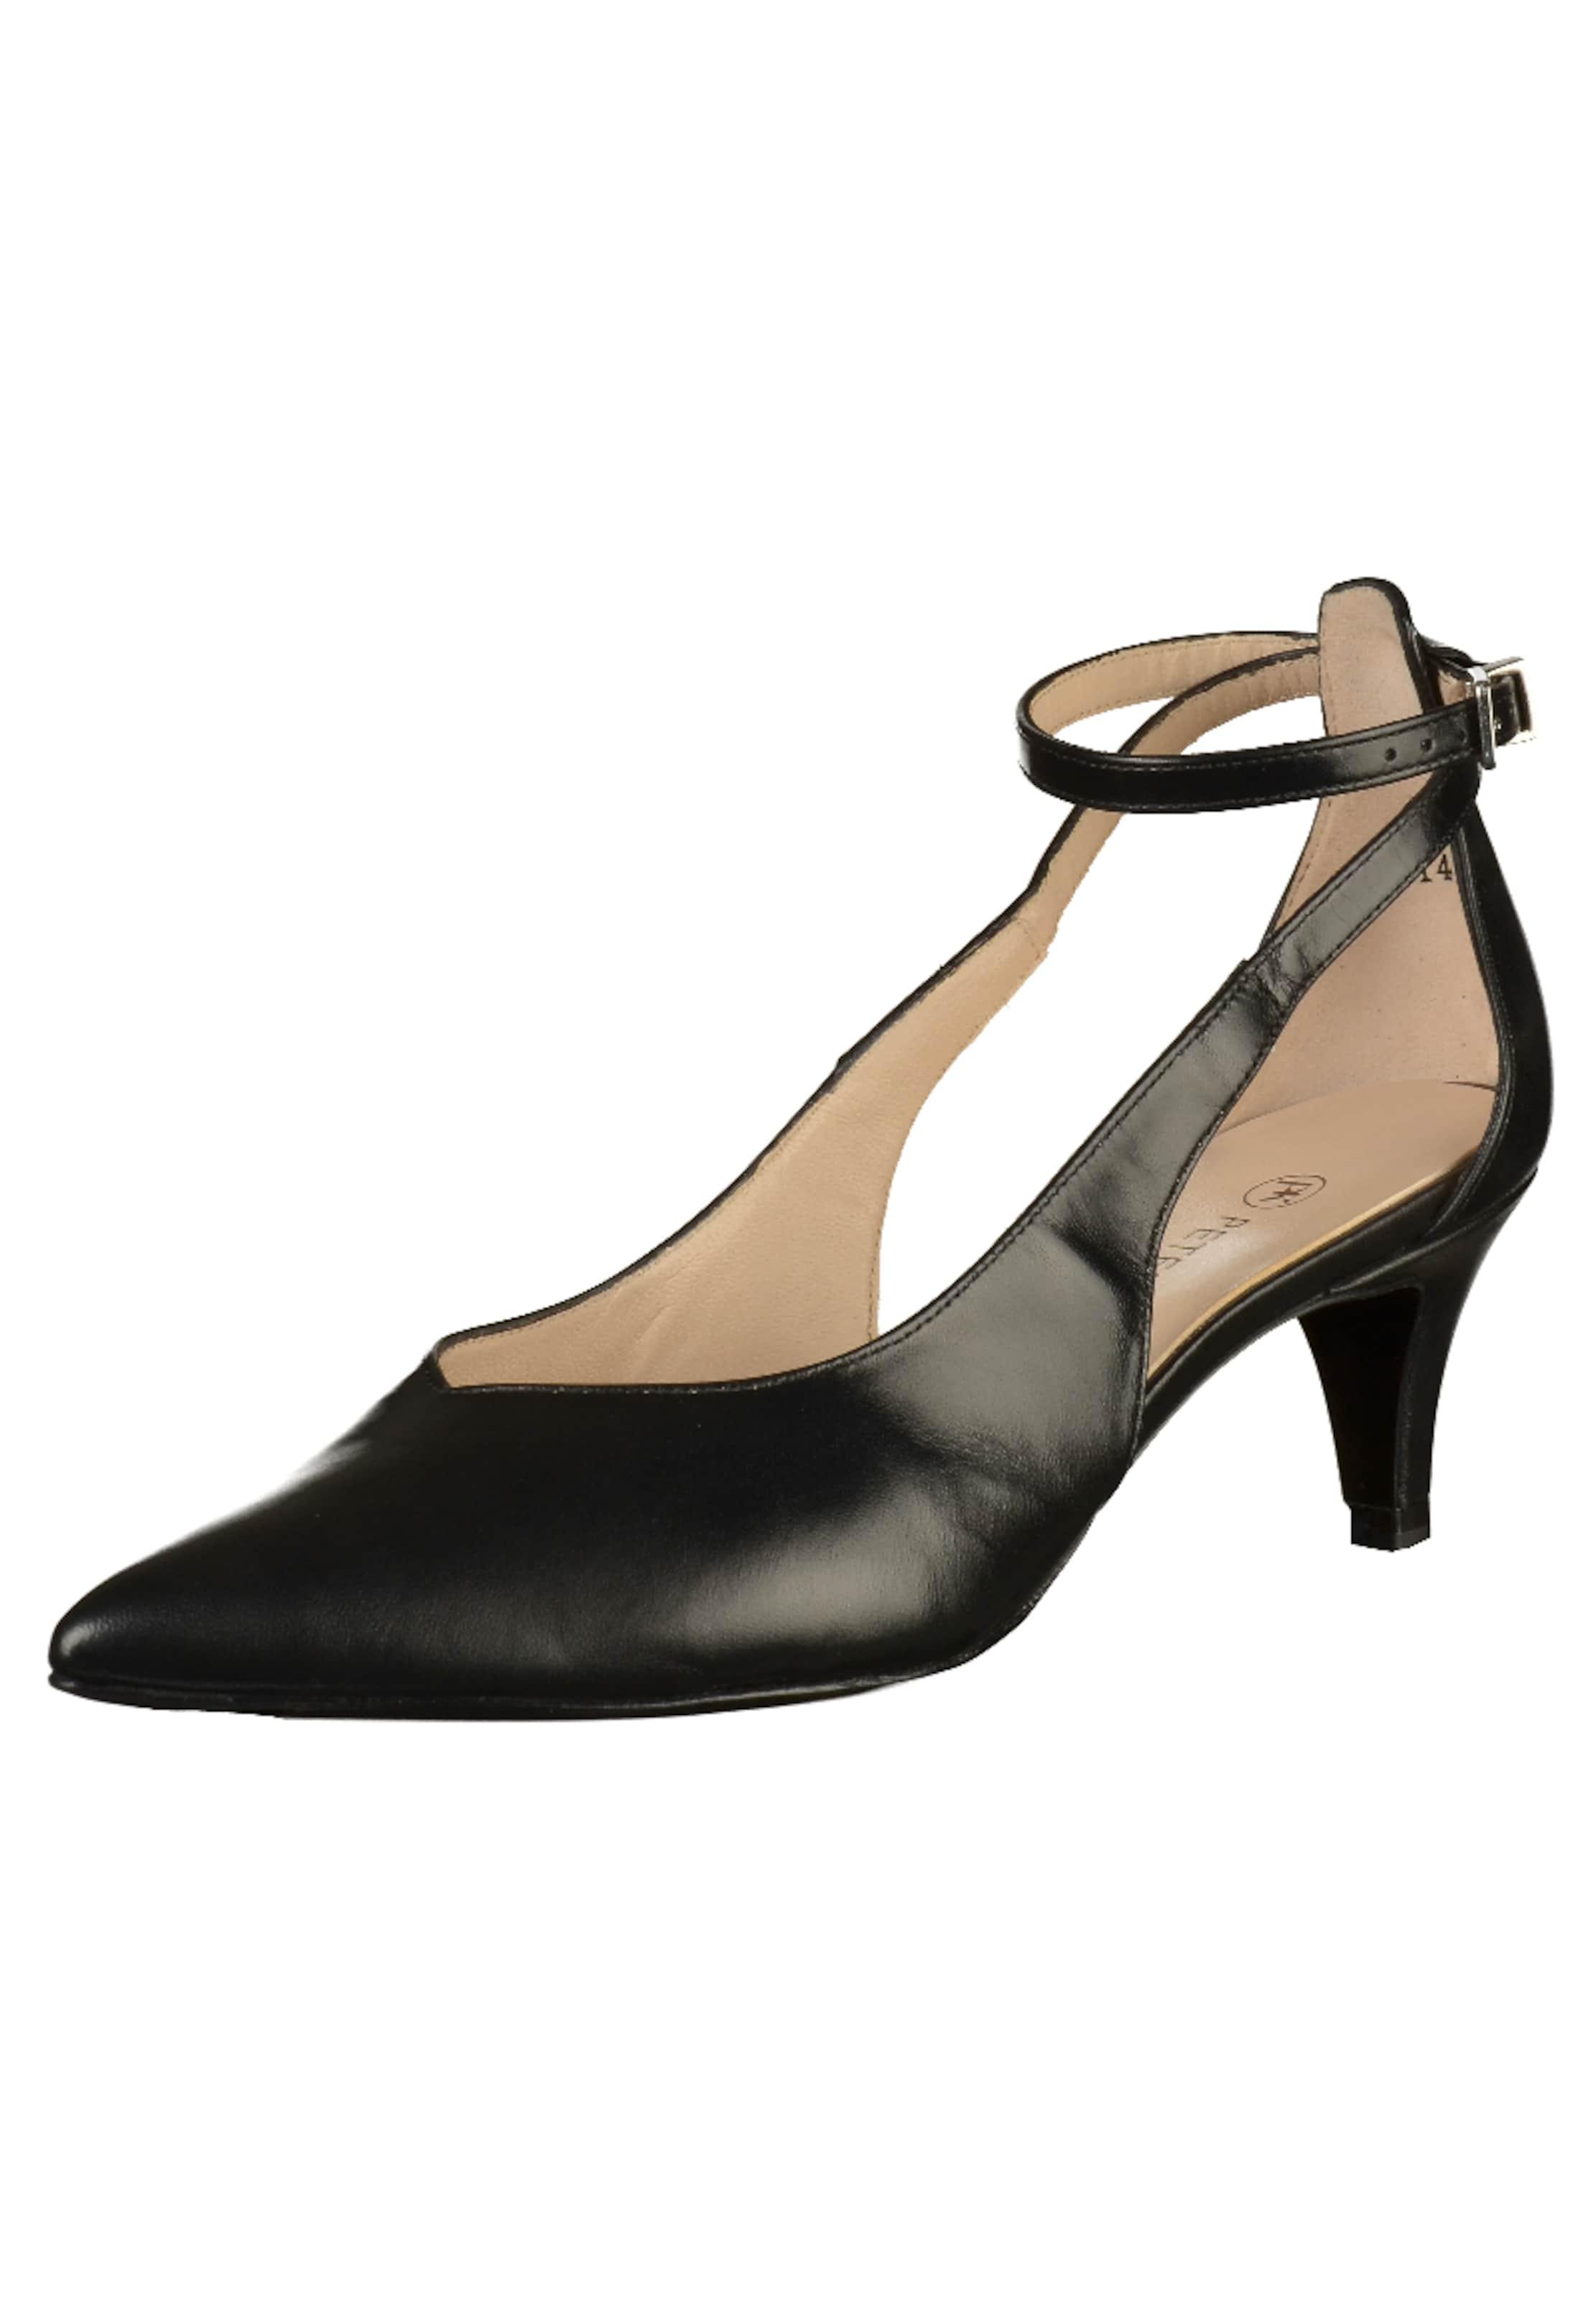 PETER KAISER Pumps Verschleißfeste billige Schuhe